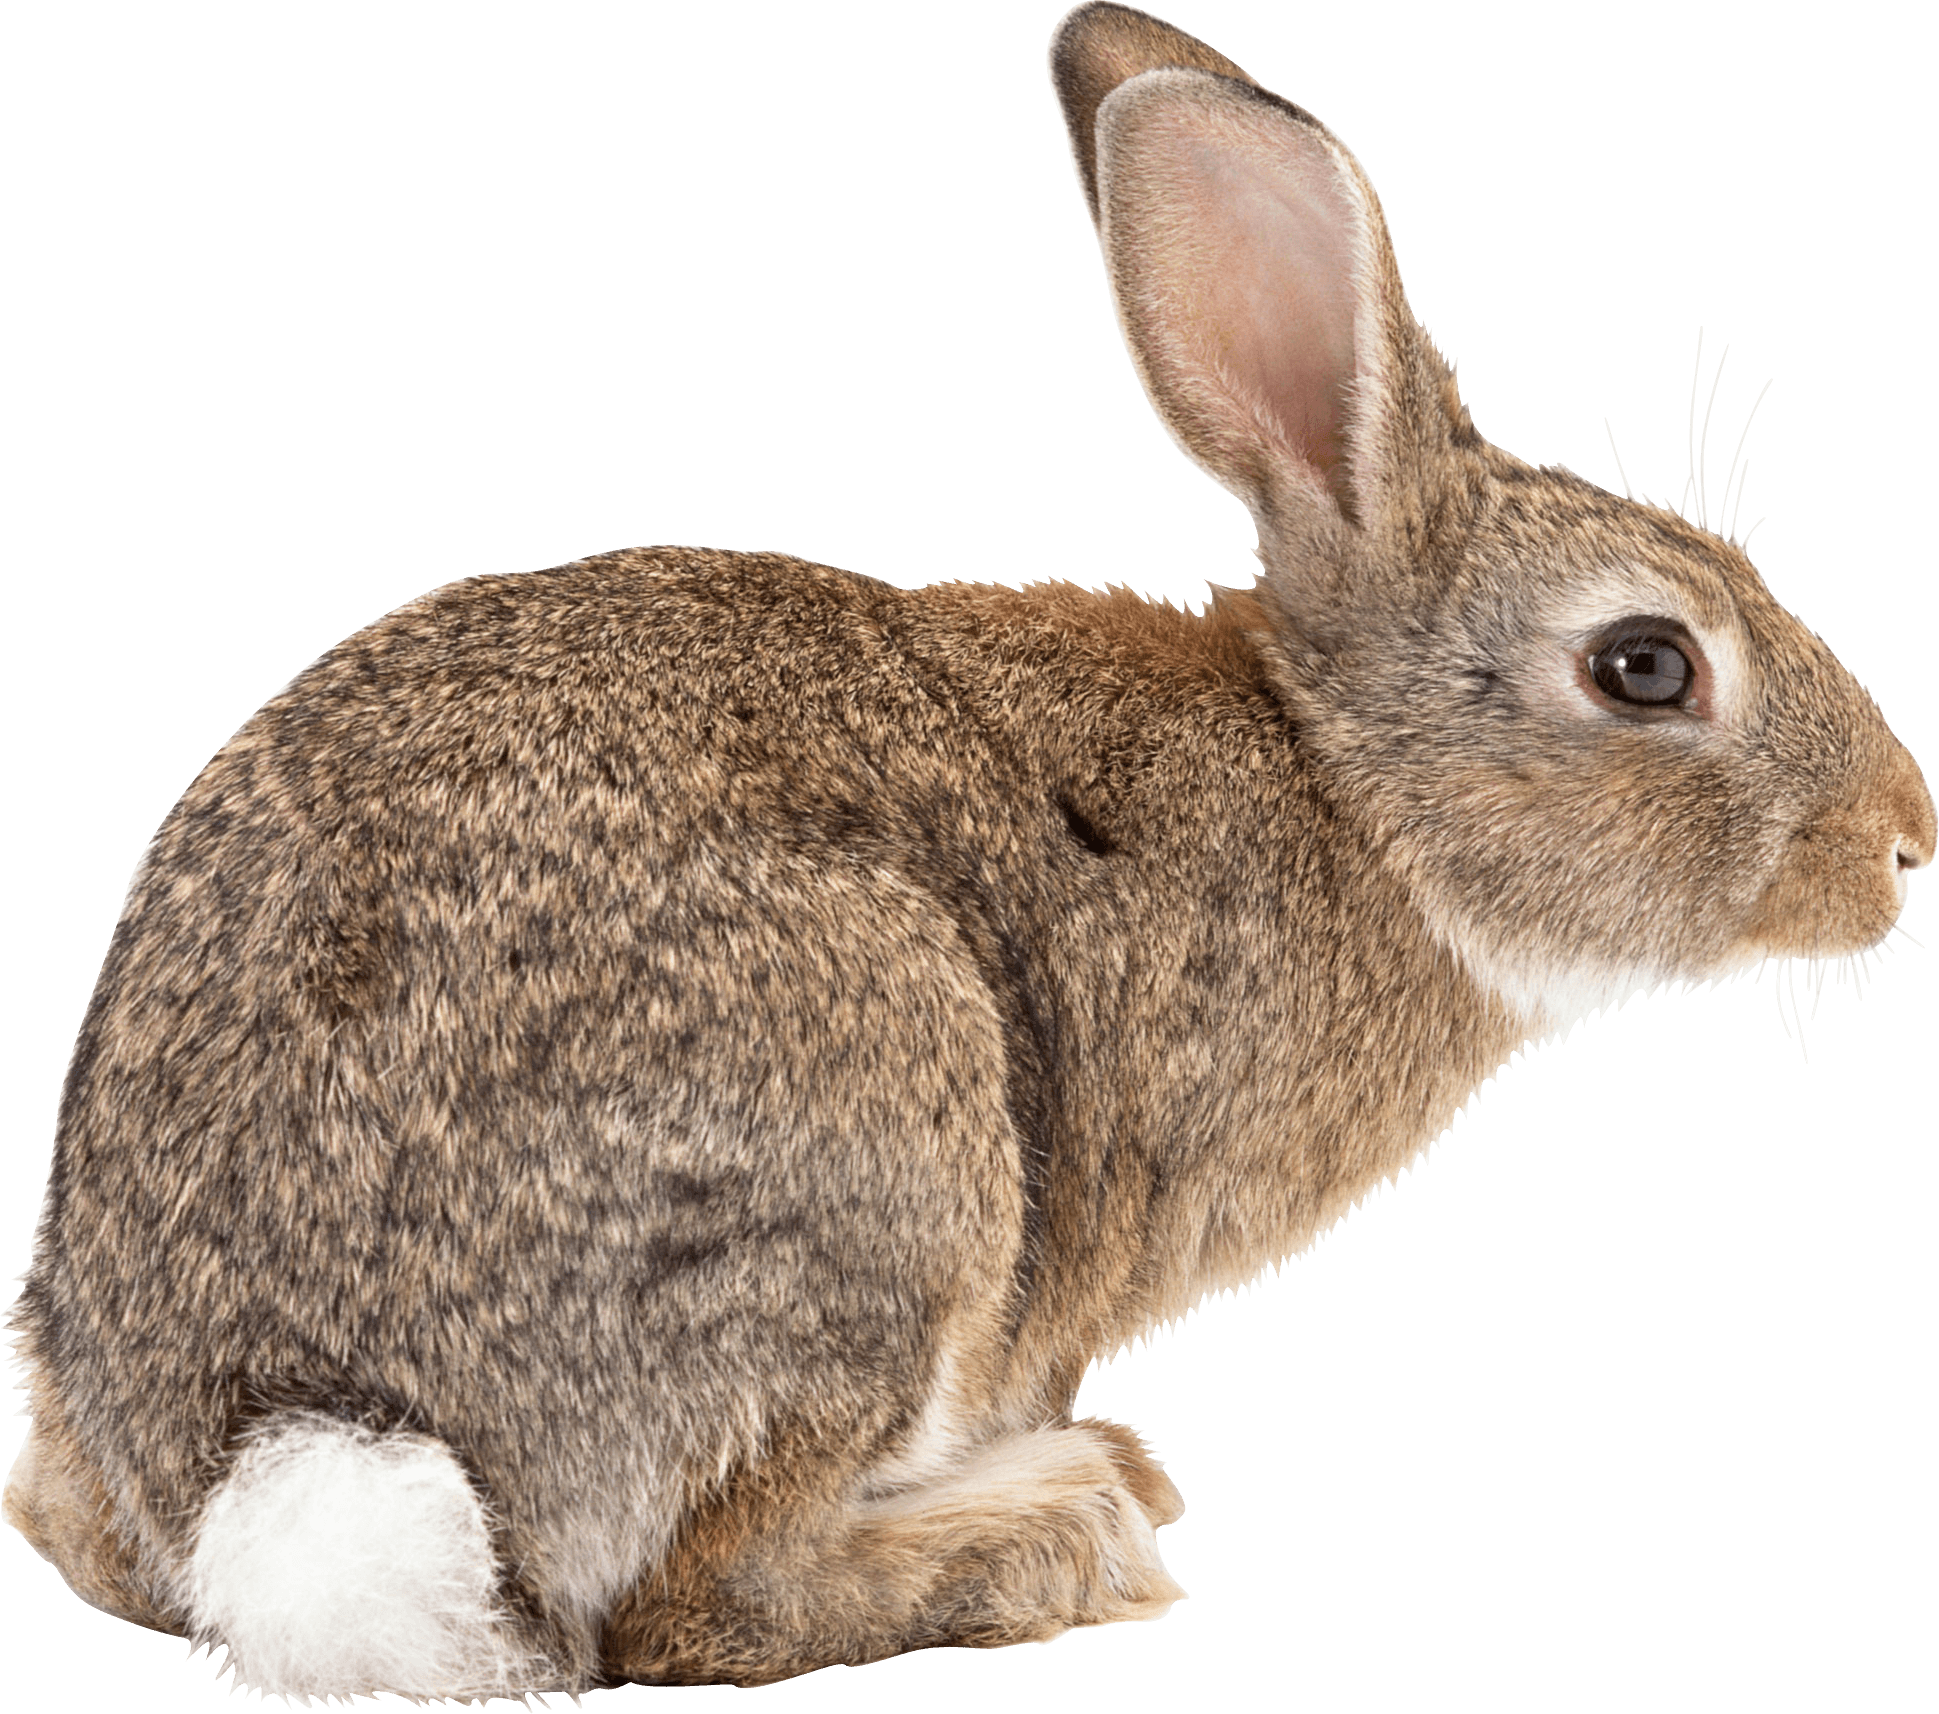 Download · Animals · Rabbits - Rabbit PNG